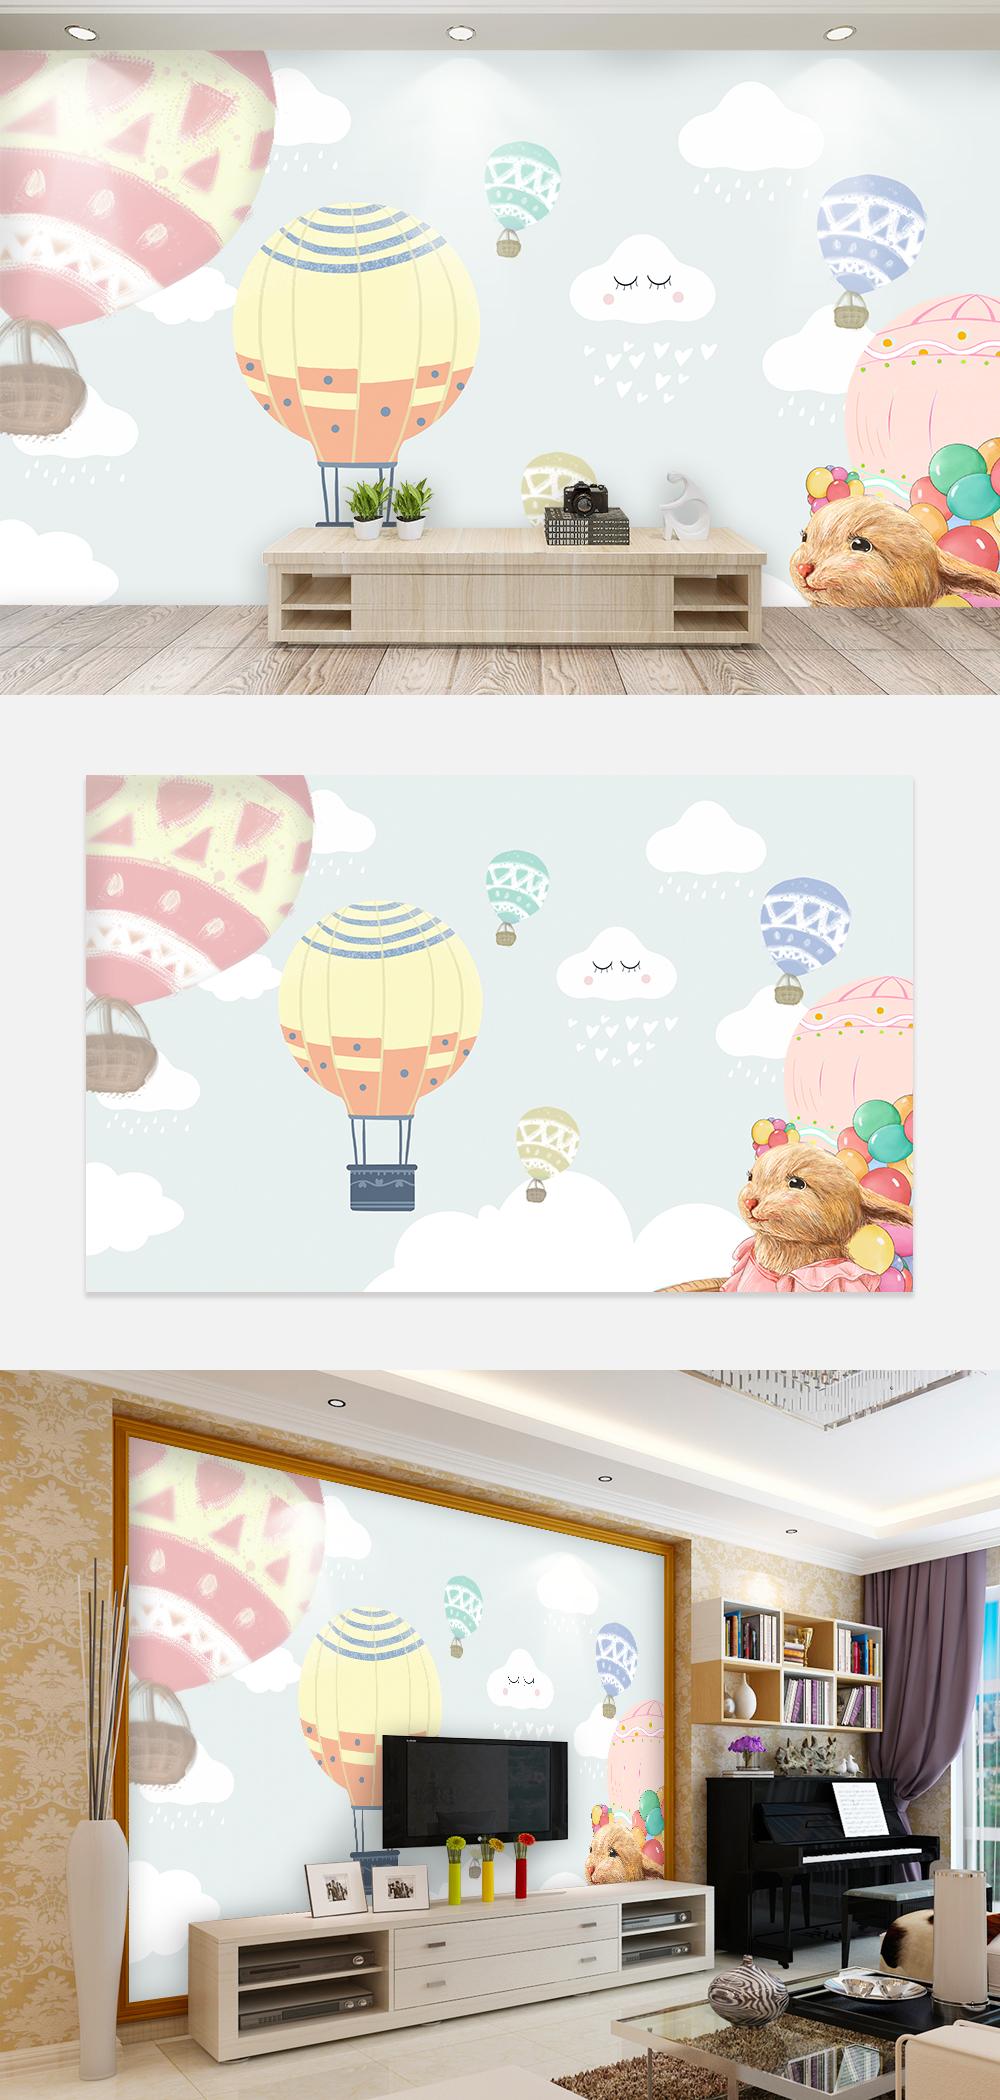 Balon Udara Panas Kartun Wallpaper Dinding Latar Belakang